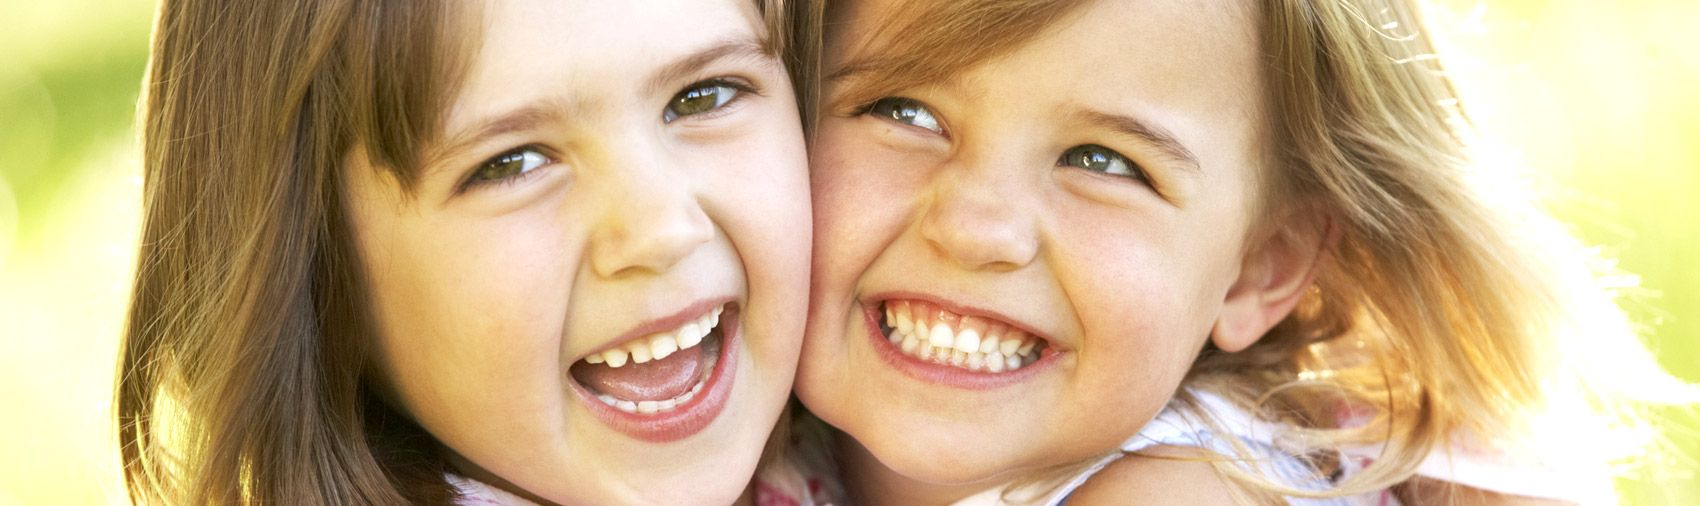 Dental Emergencies - Meredith Levine, DDS, Inc.